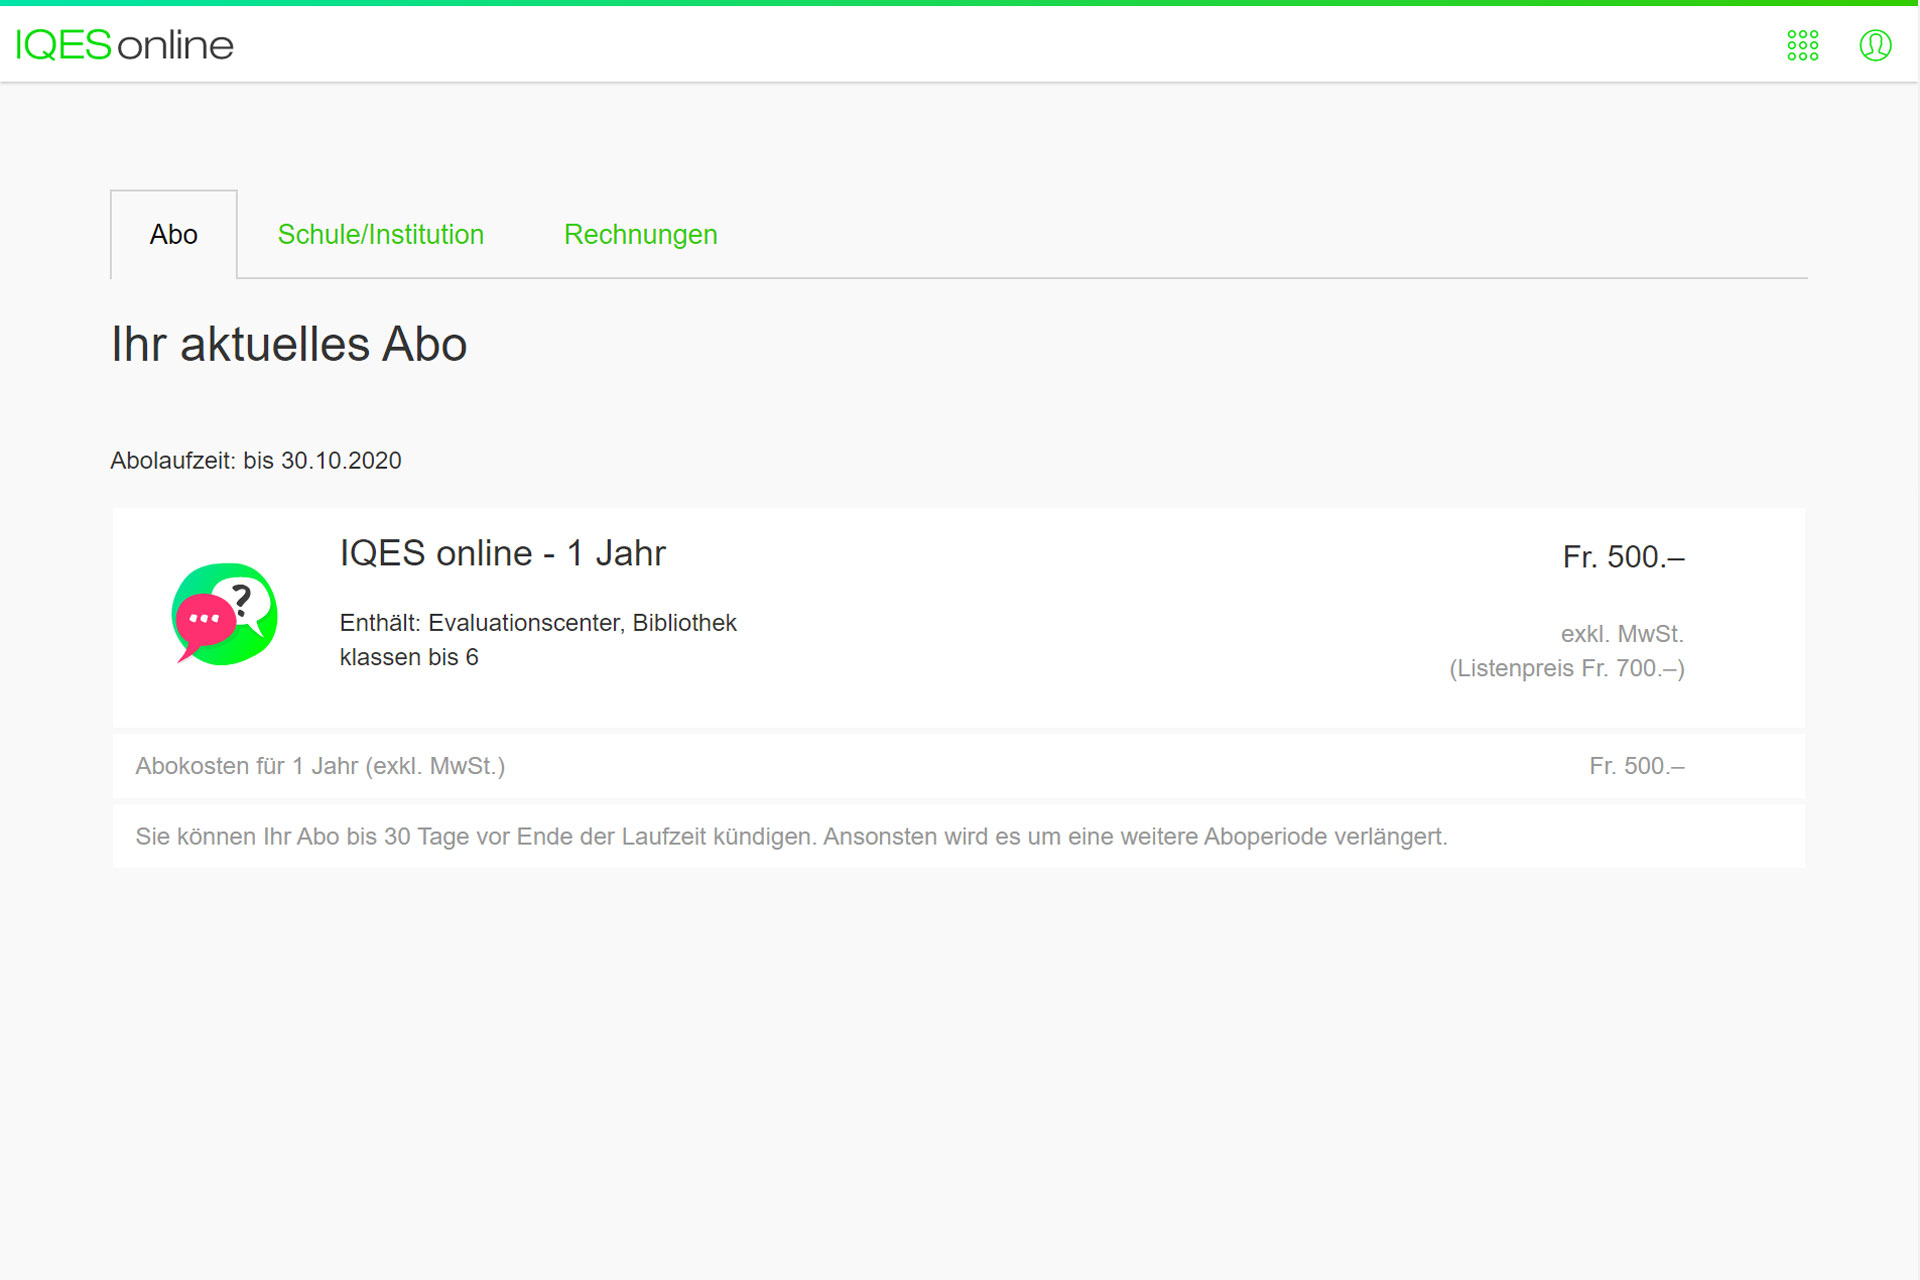 Screenshot Aboverwaltung aktuelles Abo